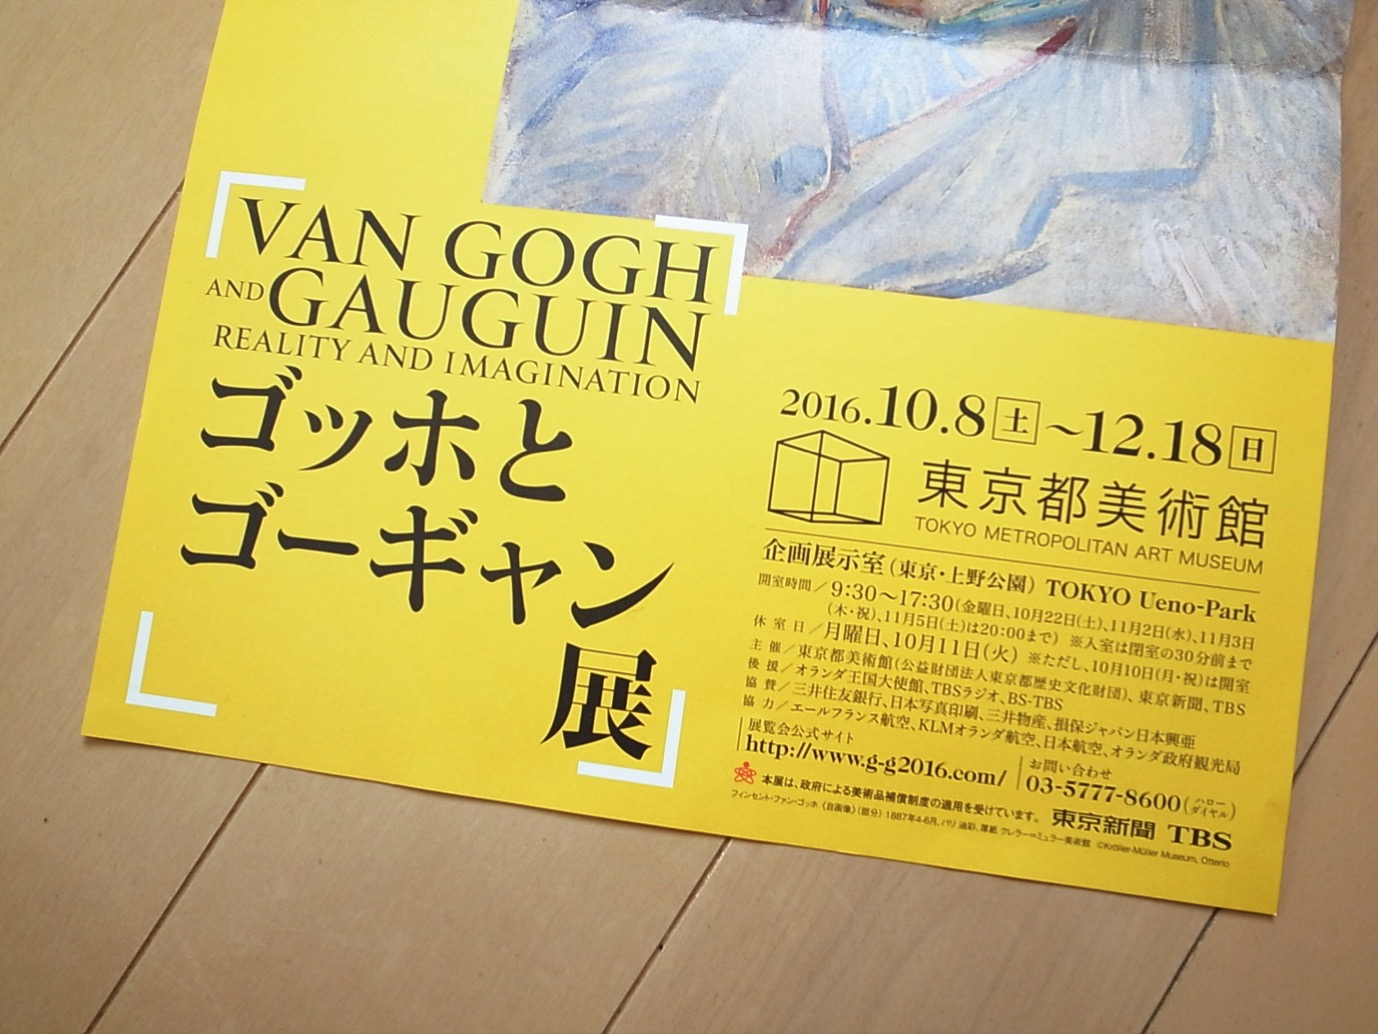 Gogh and gauguin 2